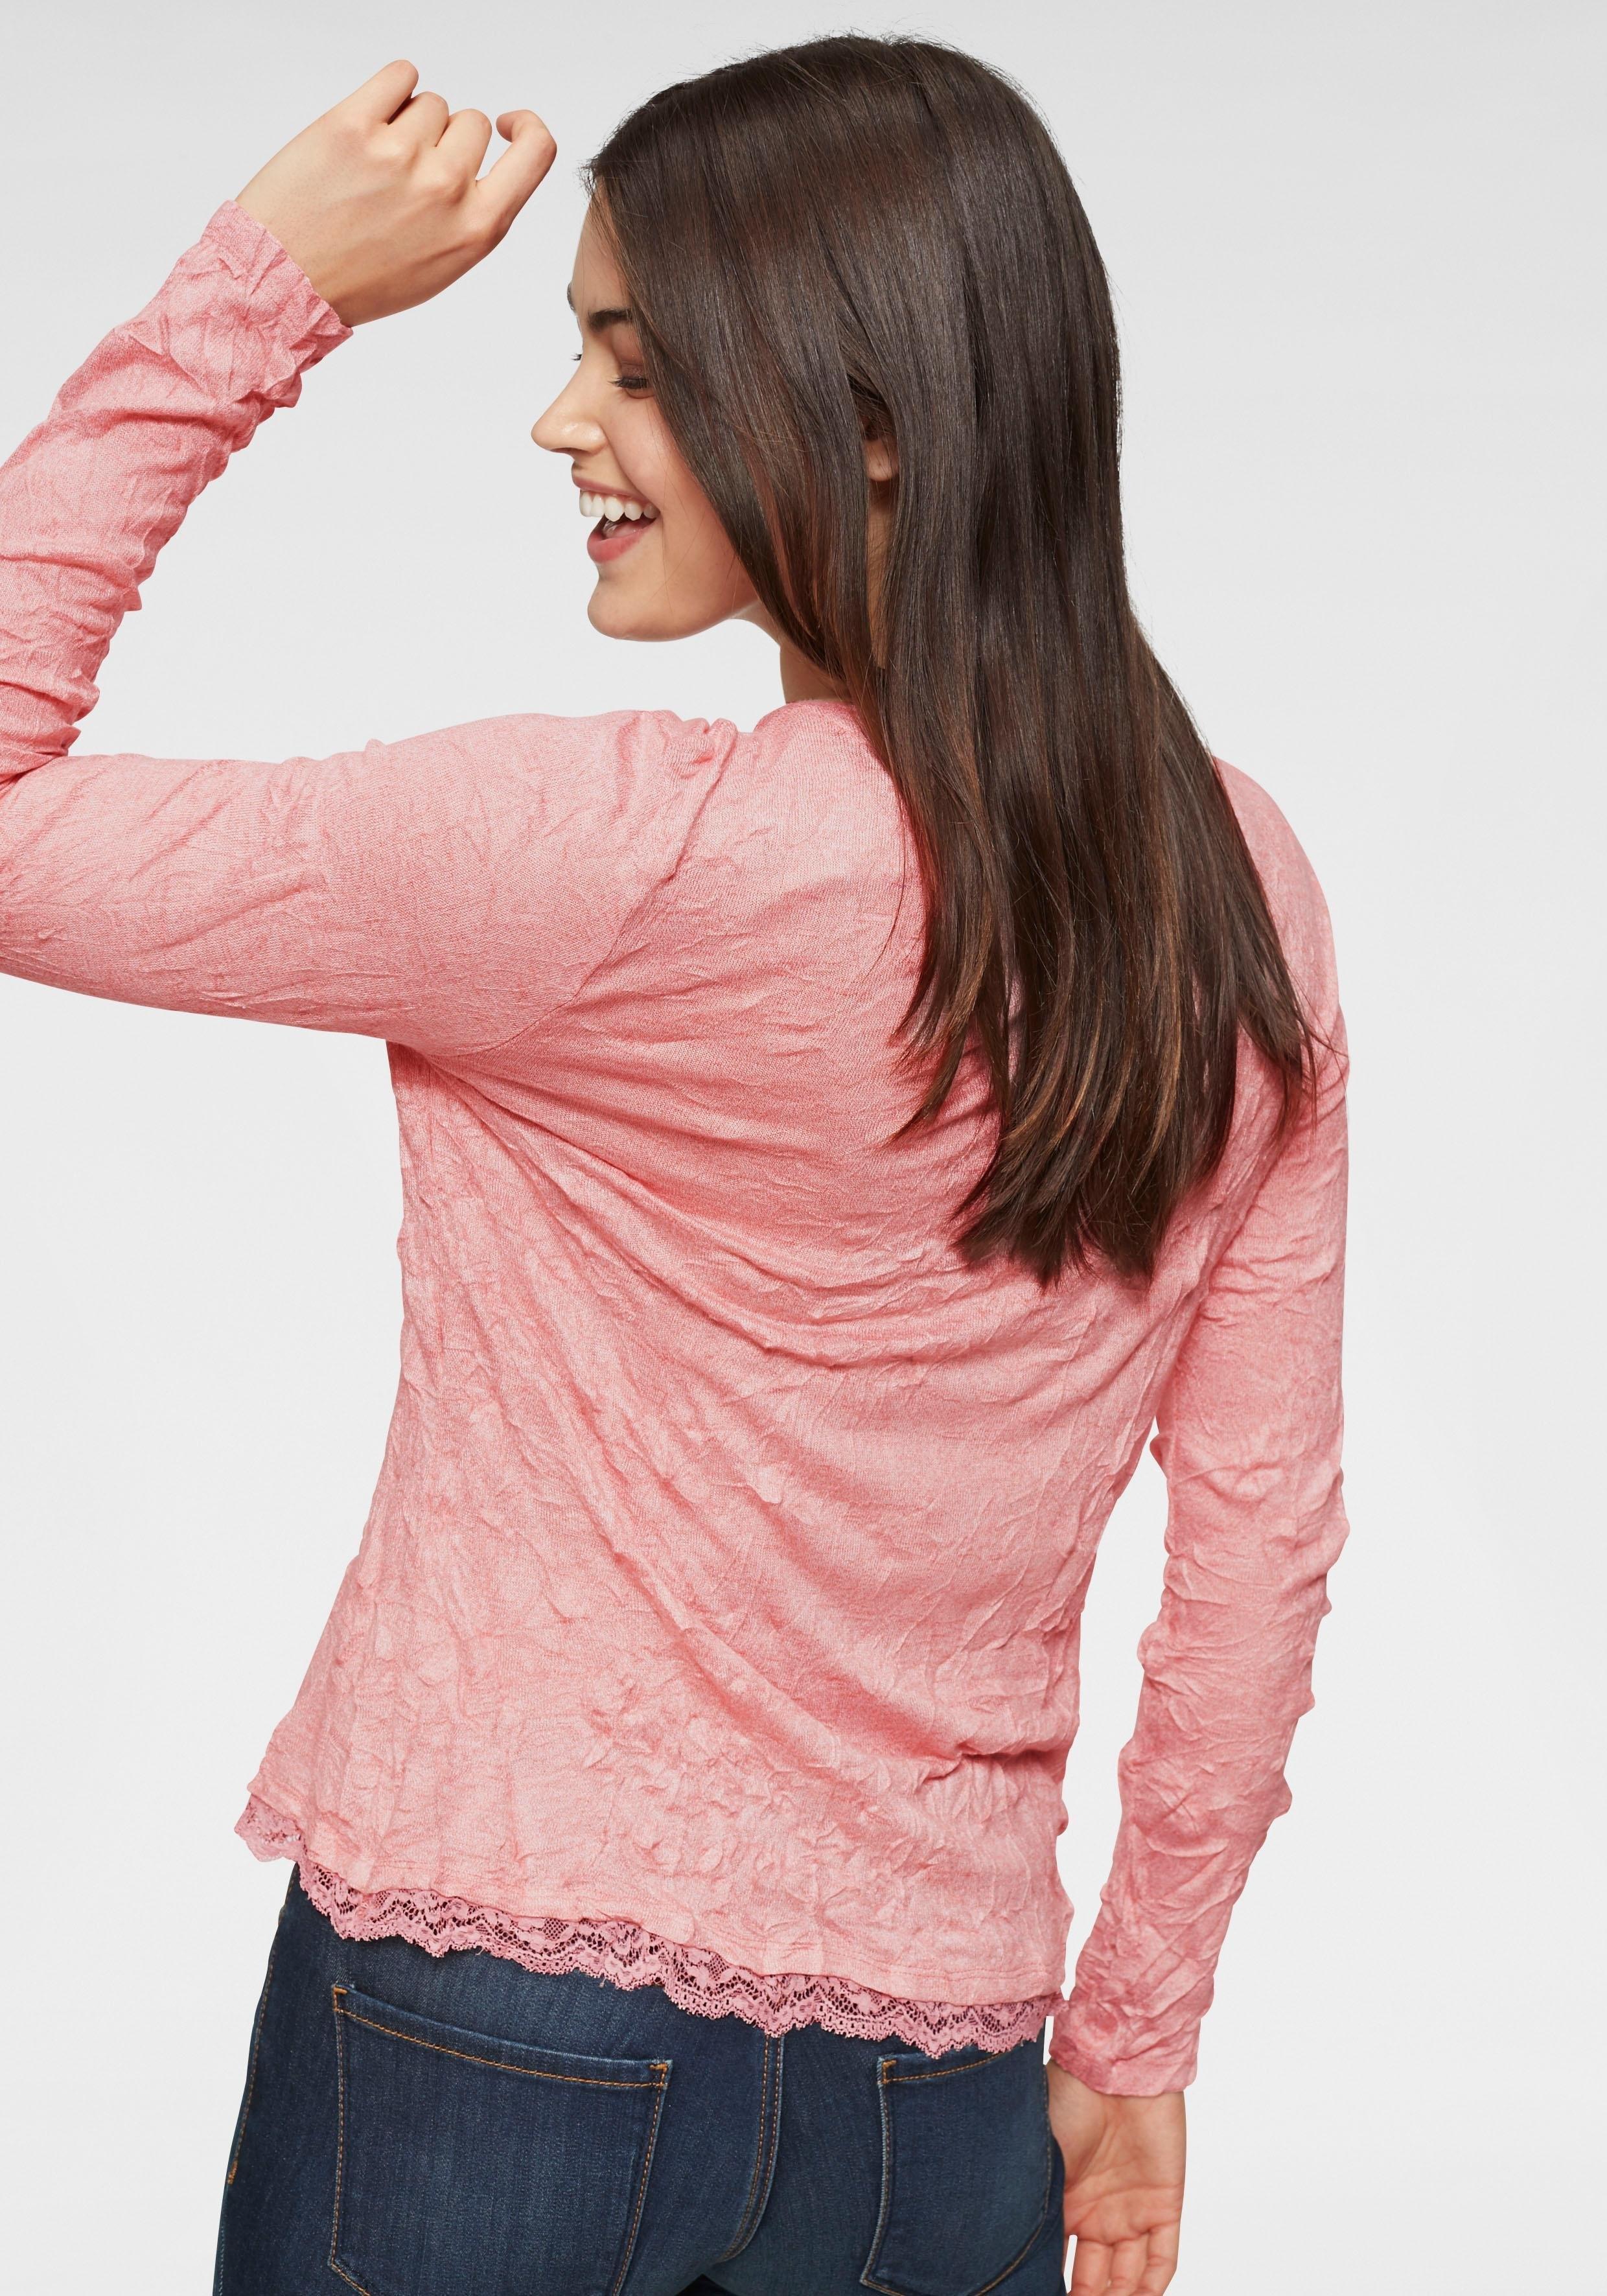 Nu Tailor Mouwen Kopen Shirt Met Tom Online Lange zSVMqUGp